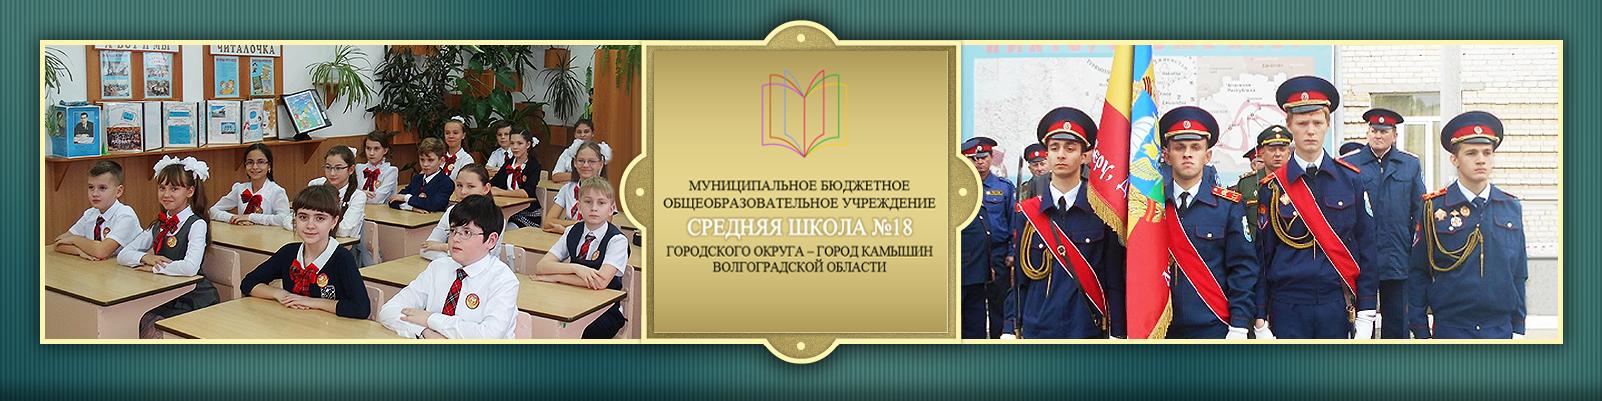 kamssoh18.ru